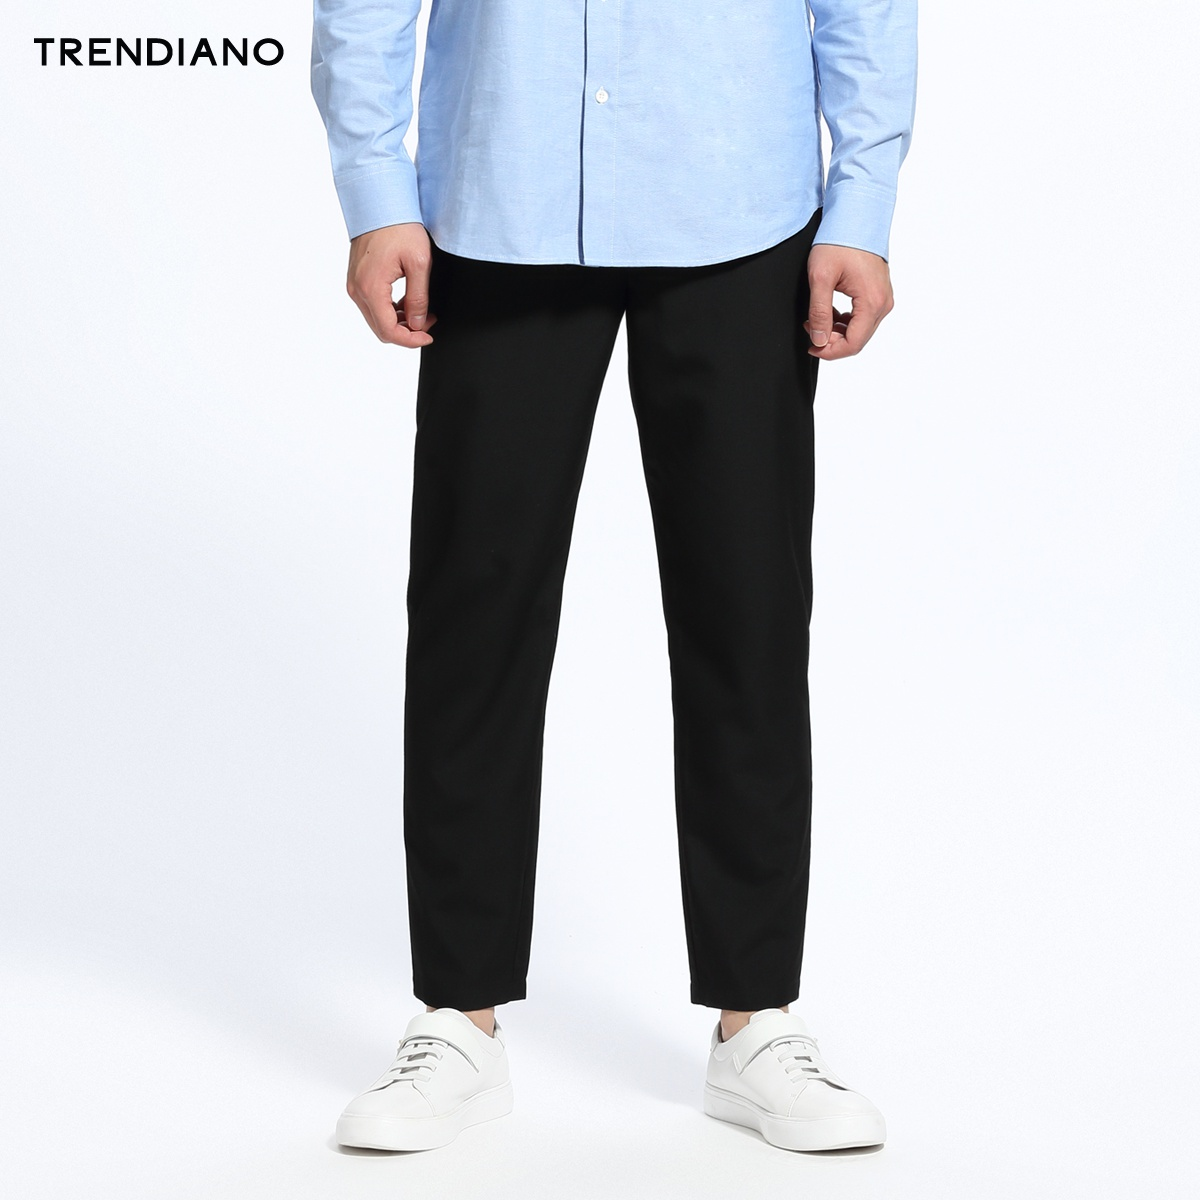 TRENDIANO纯色刺绣九分裤休闲裤3GC206766P